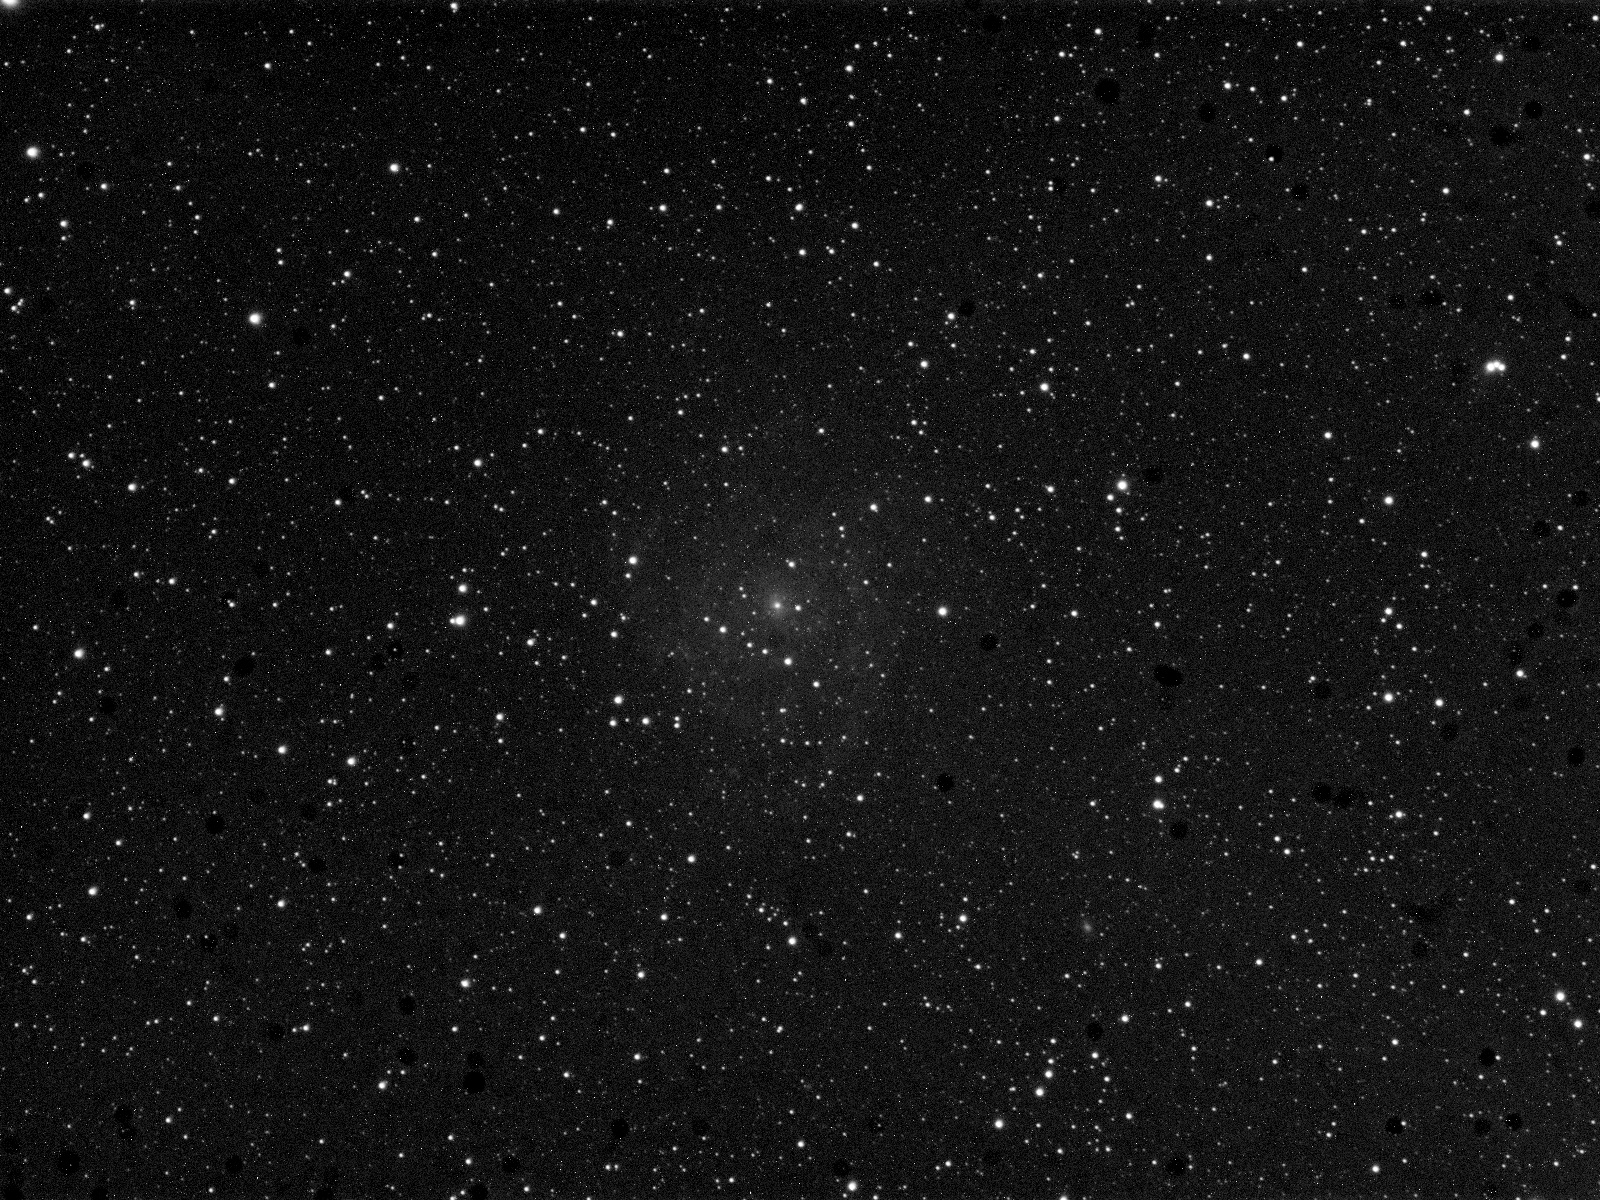 1962380468_FireworksGalaxyIC342600ssub.jpg.2fc2e181a3a7e9fd5ac4caf0c038f95d.jpg